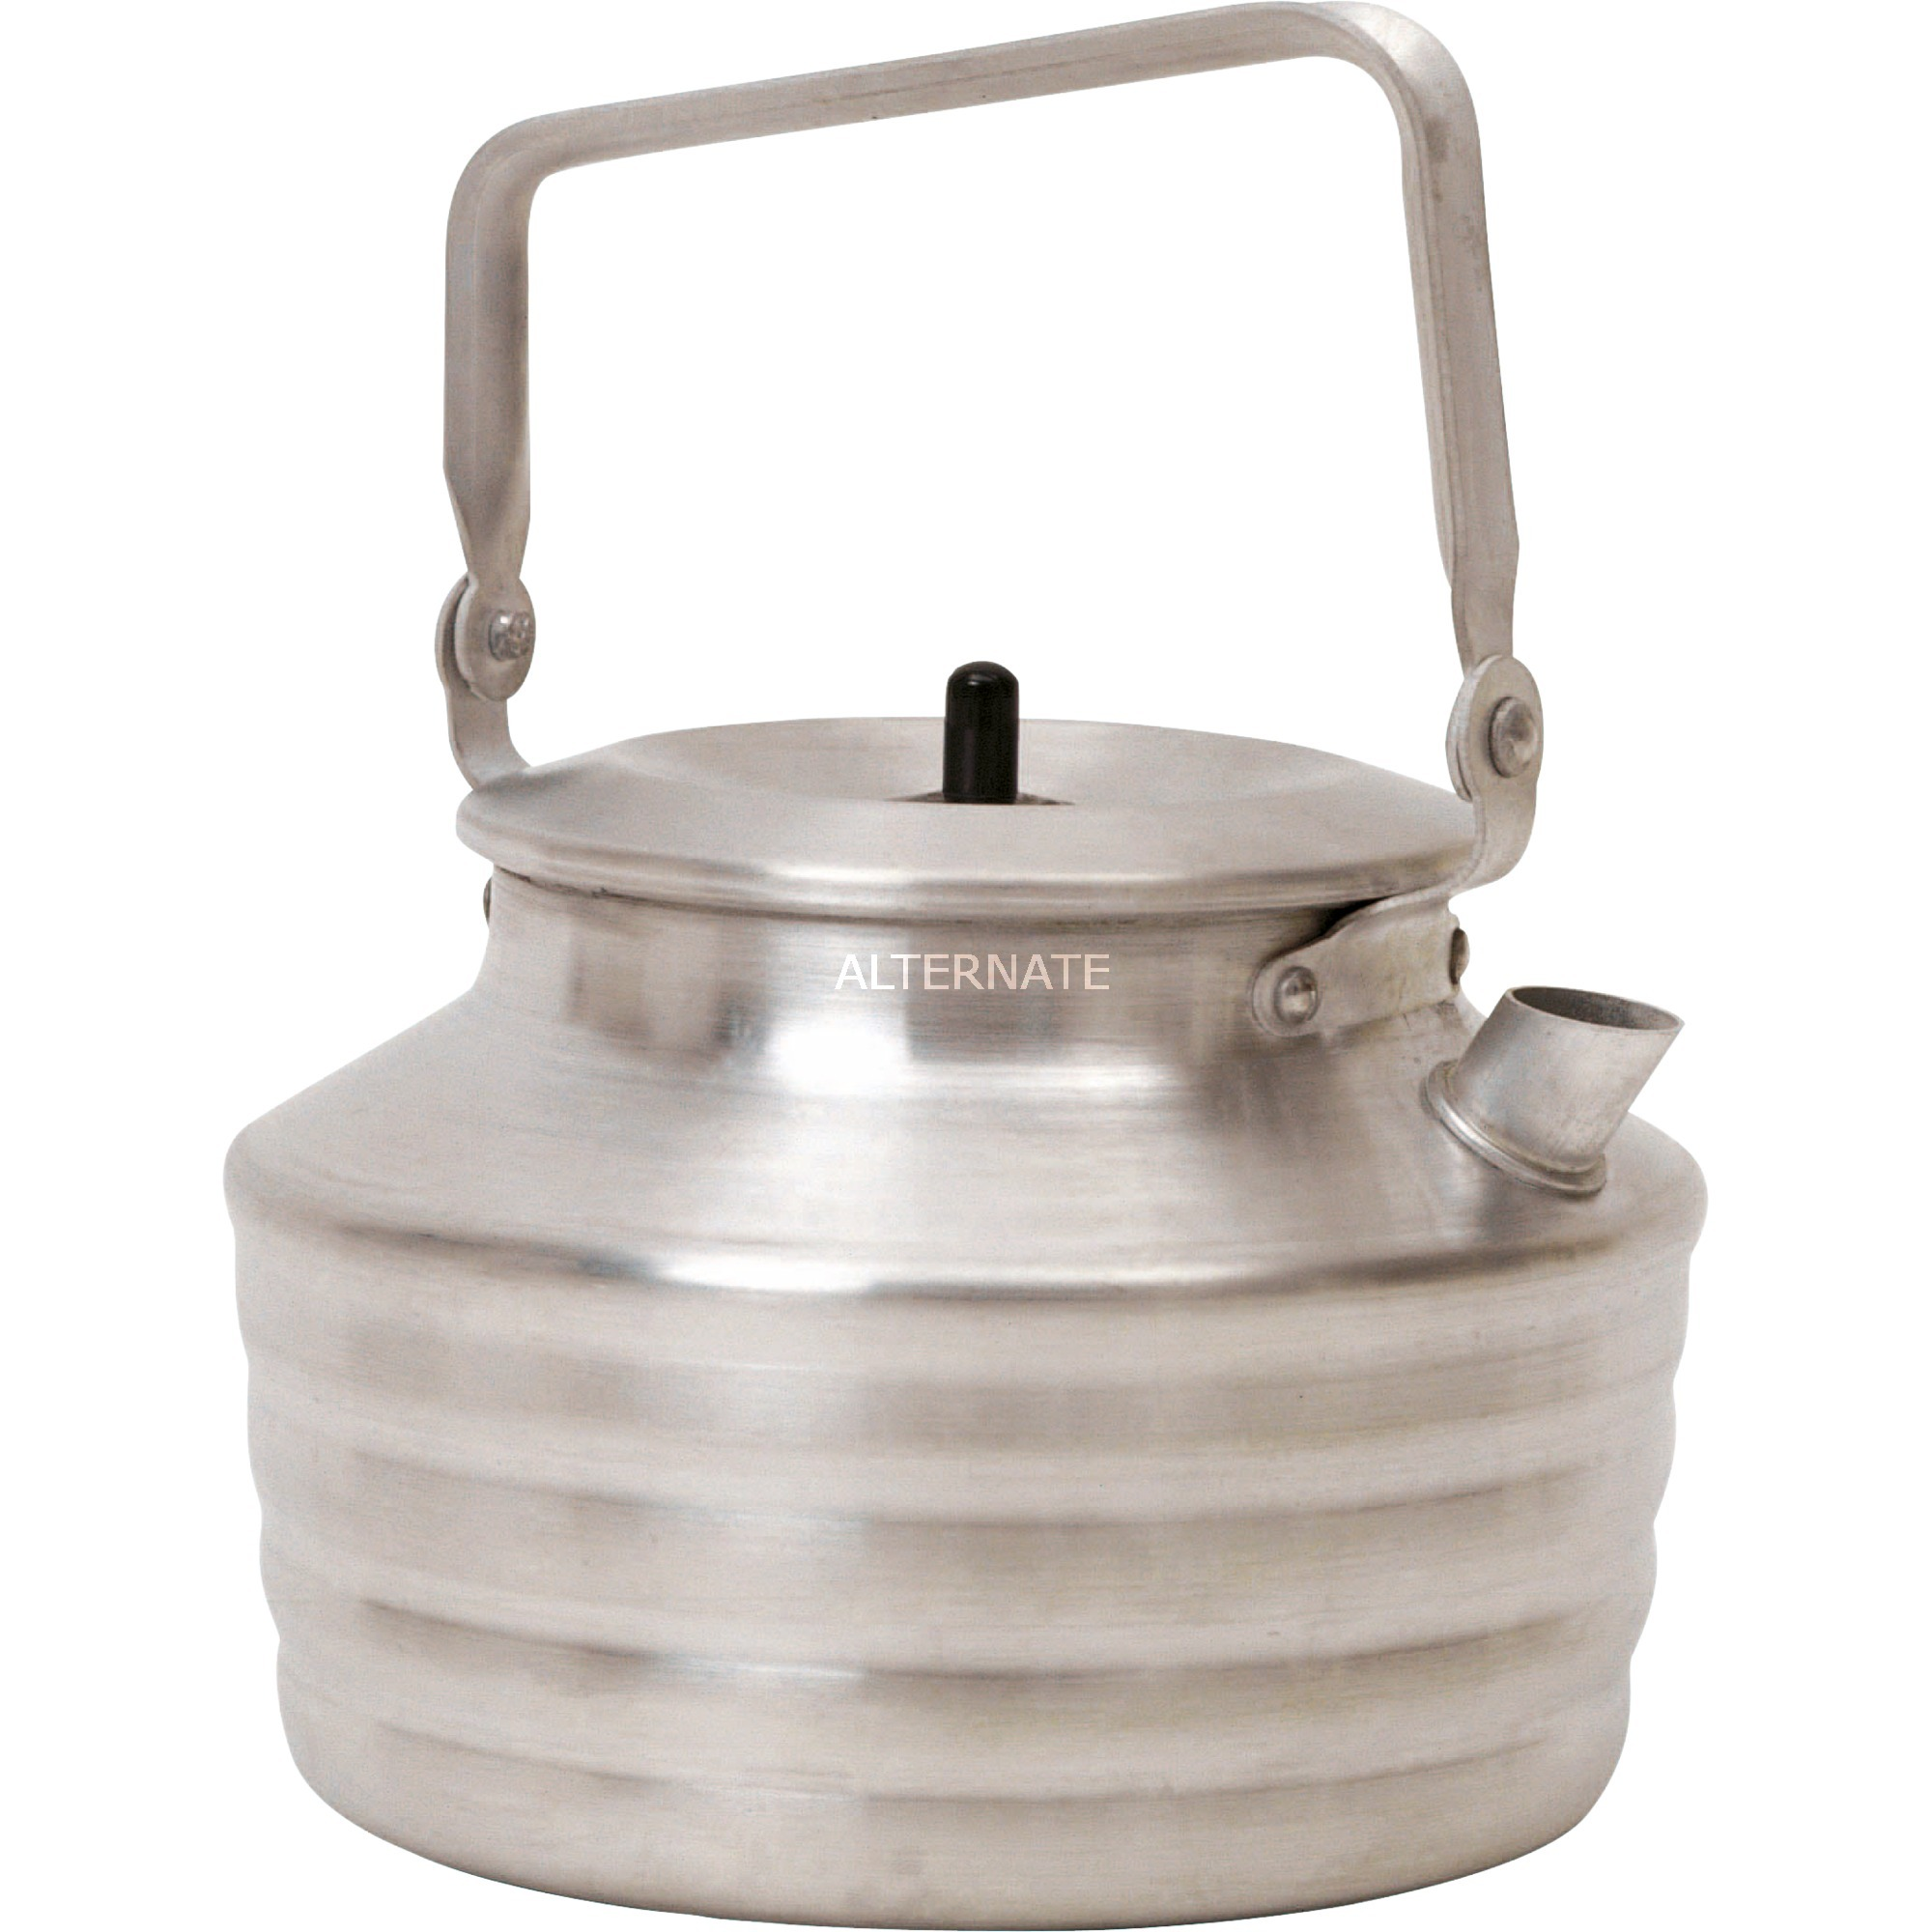 202027 Tetera 1.3L Aluminio utensilio de cocina para camping, Olla